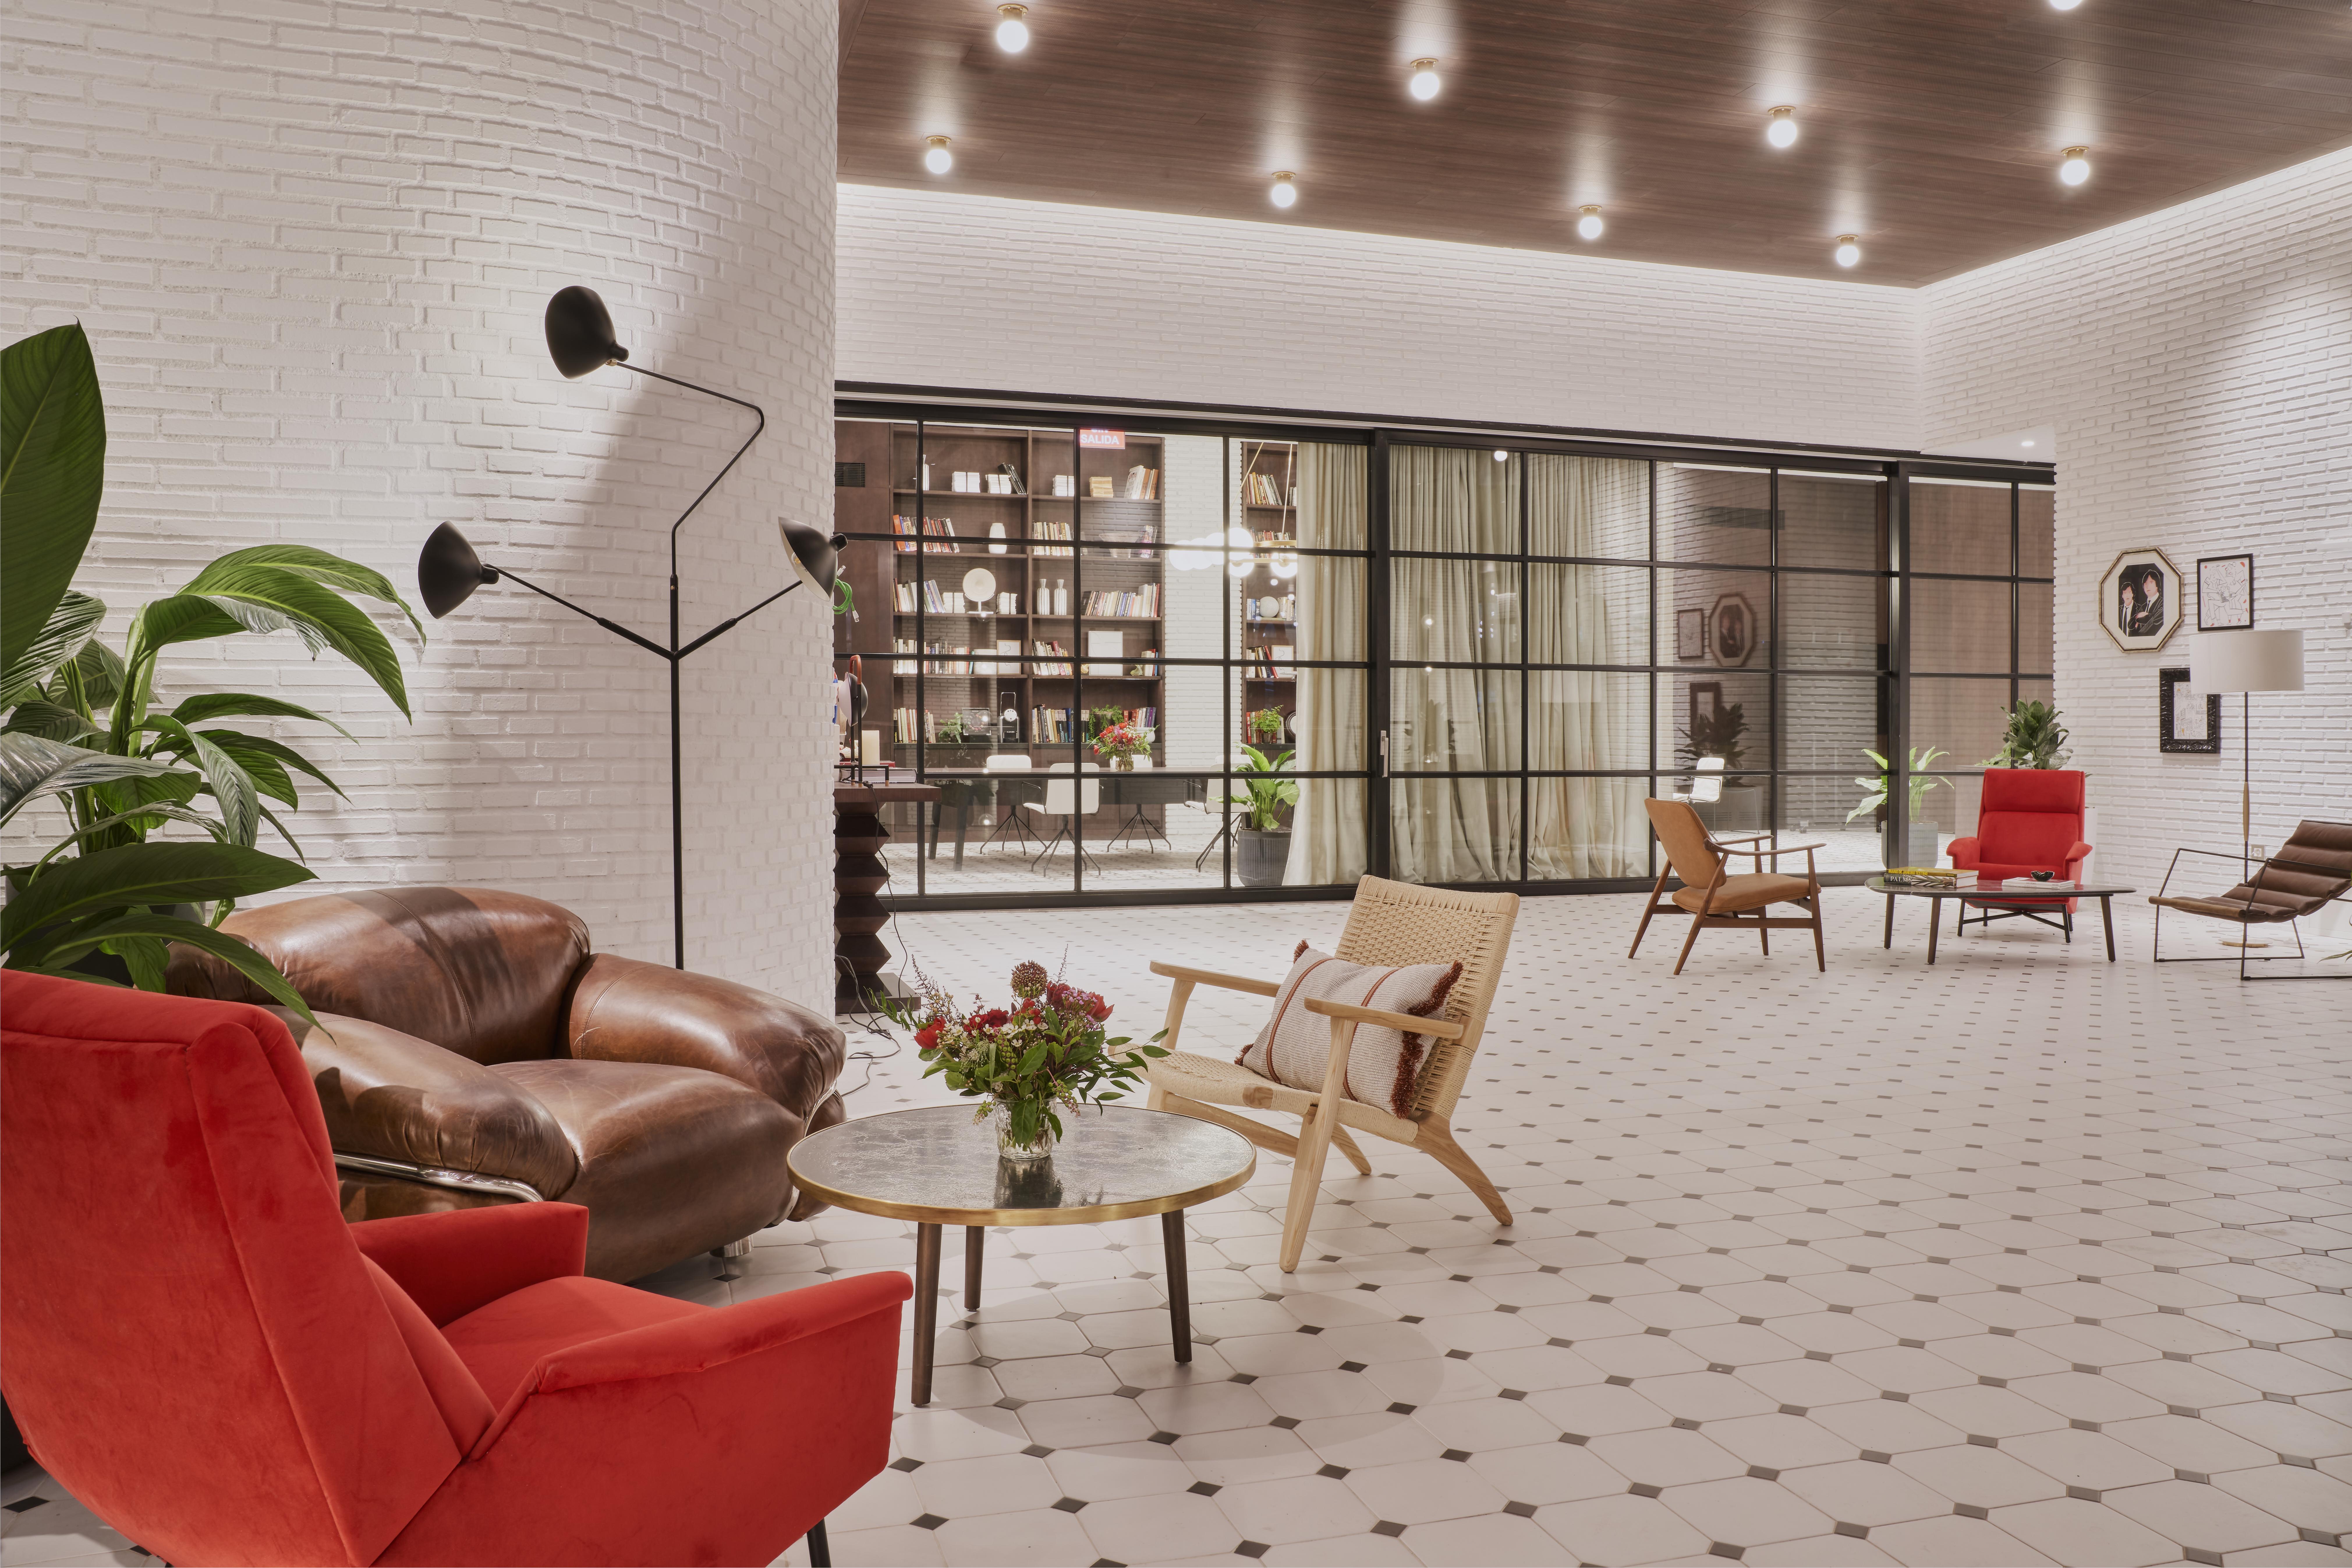 Imagen del hall del hotel / Hilton